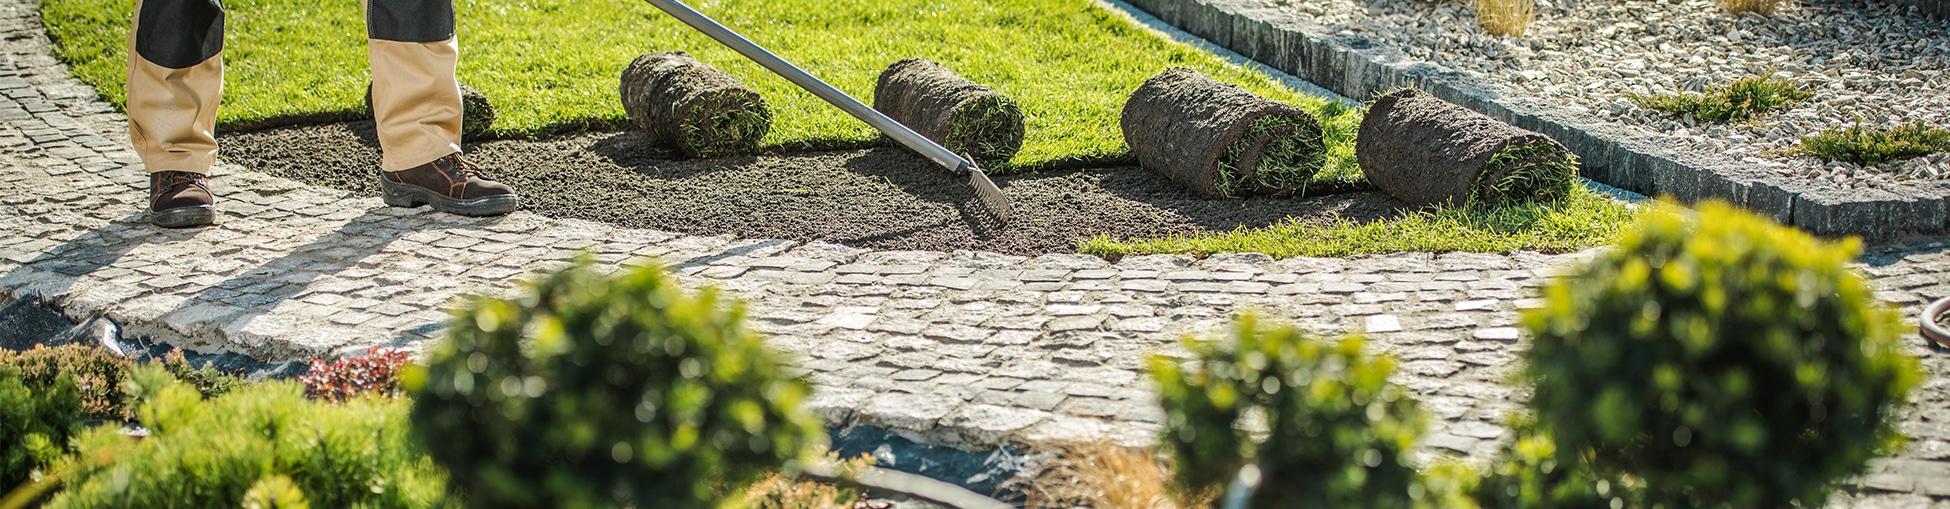 milton keynes landscape gardening